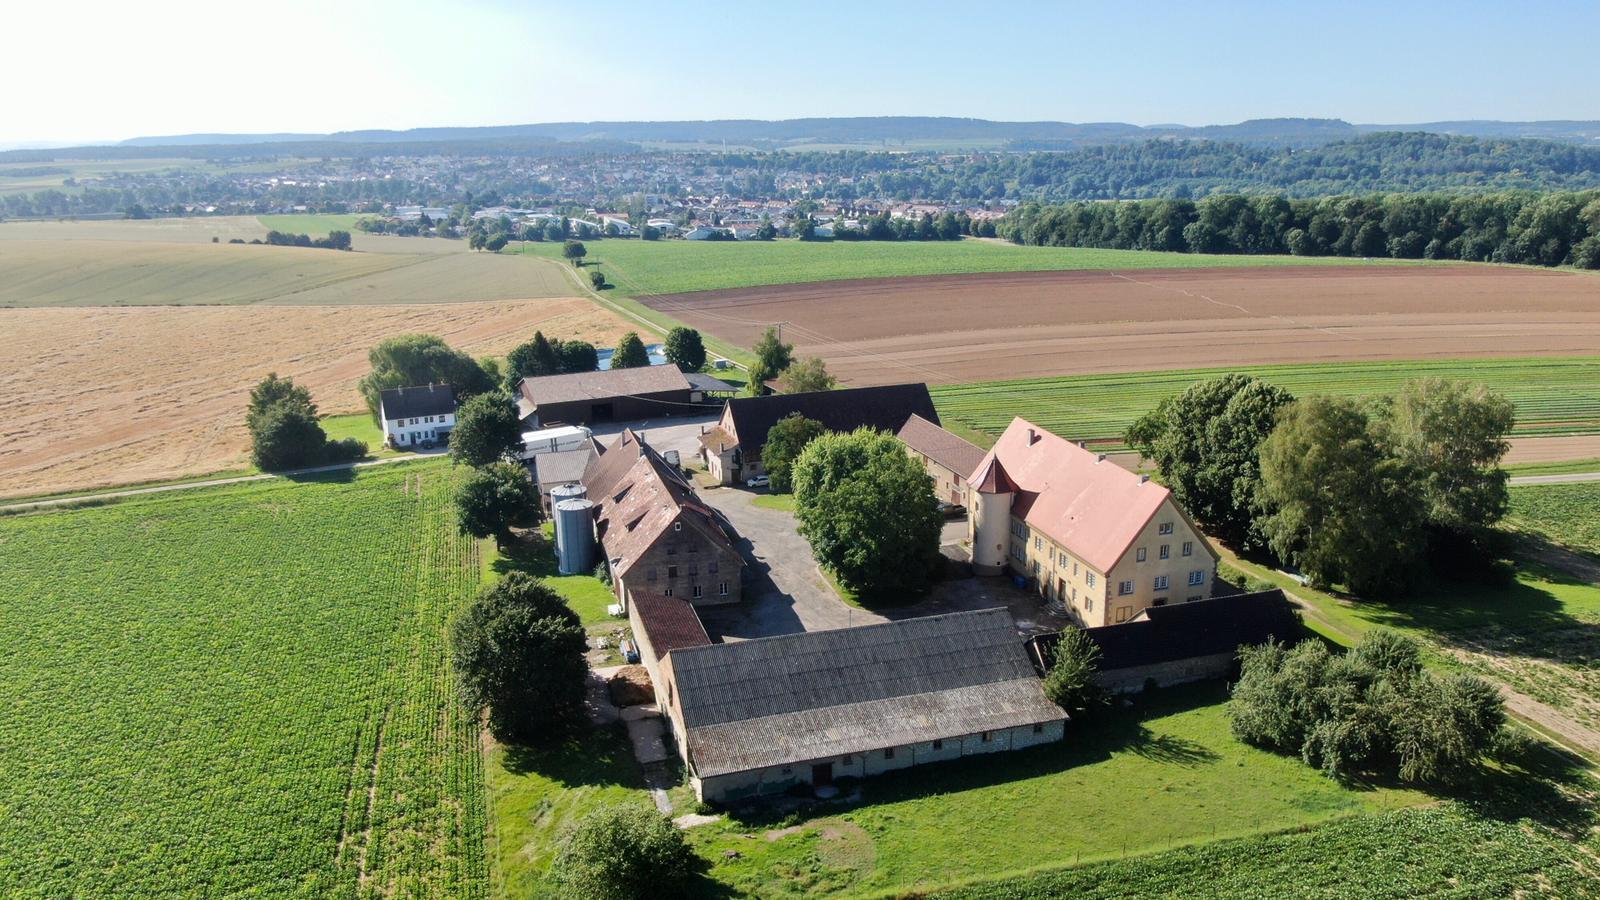 PHOTO-2020-06-24-21-54-32 - Jagdschule Heilbronn & Jagdschein Heilbronn